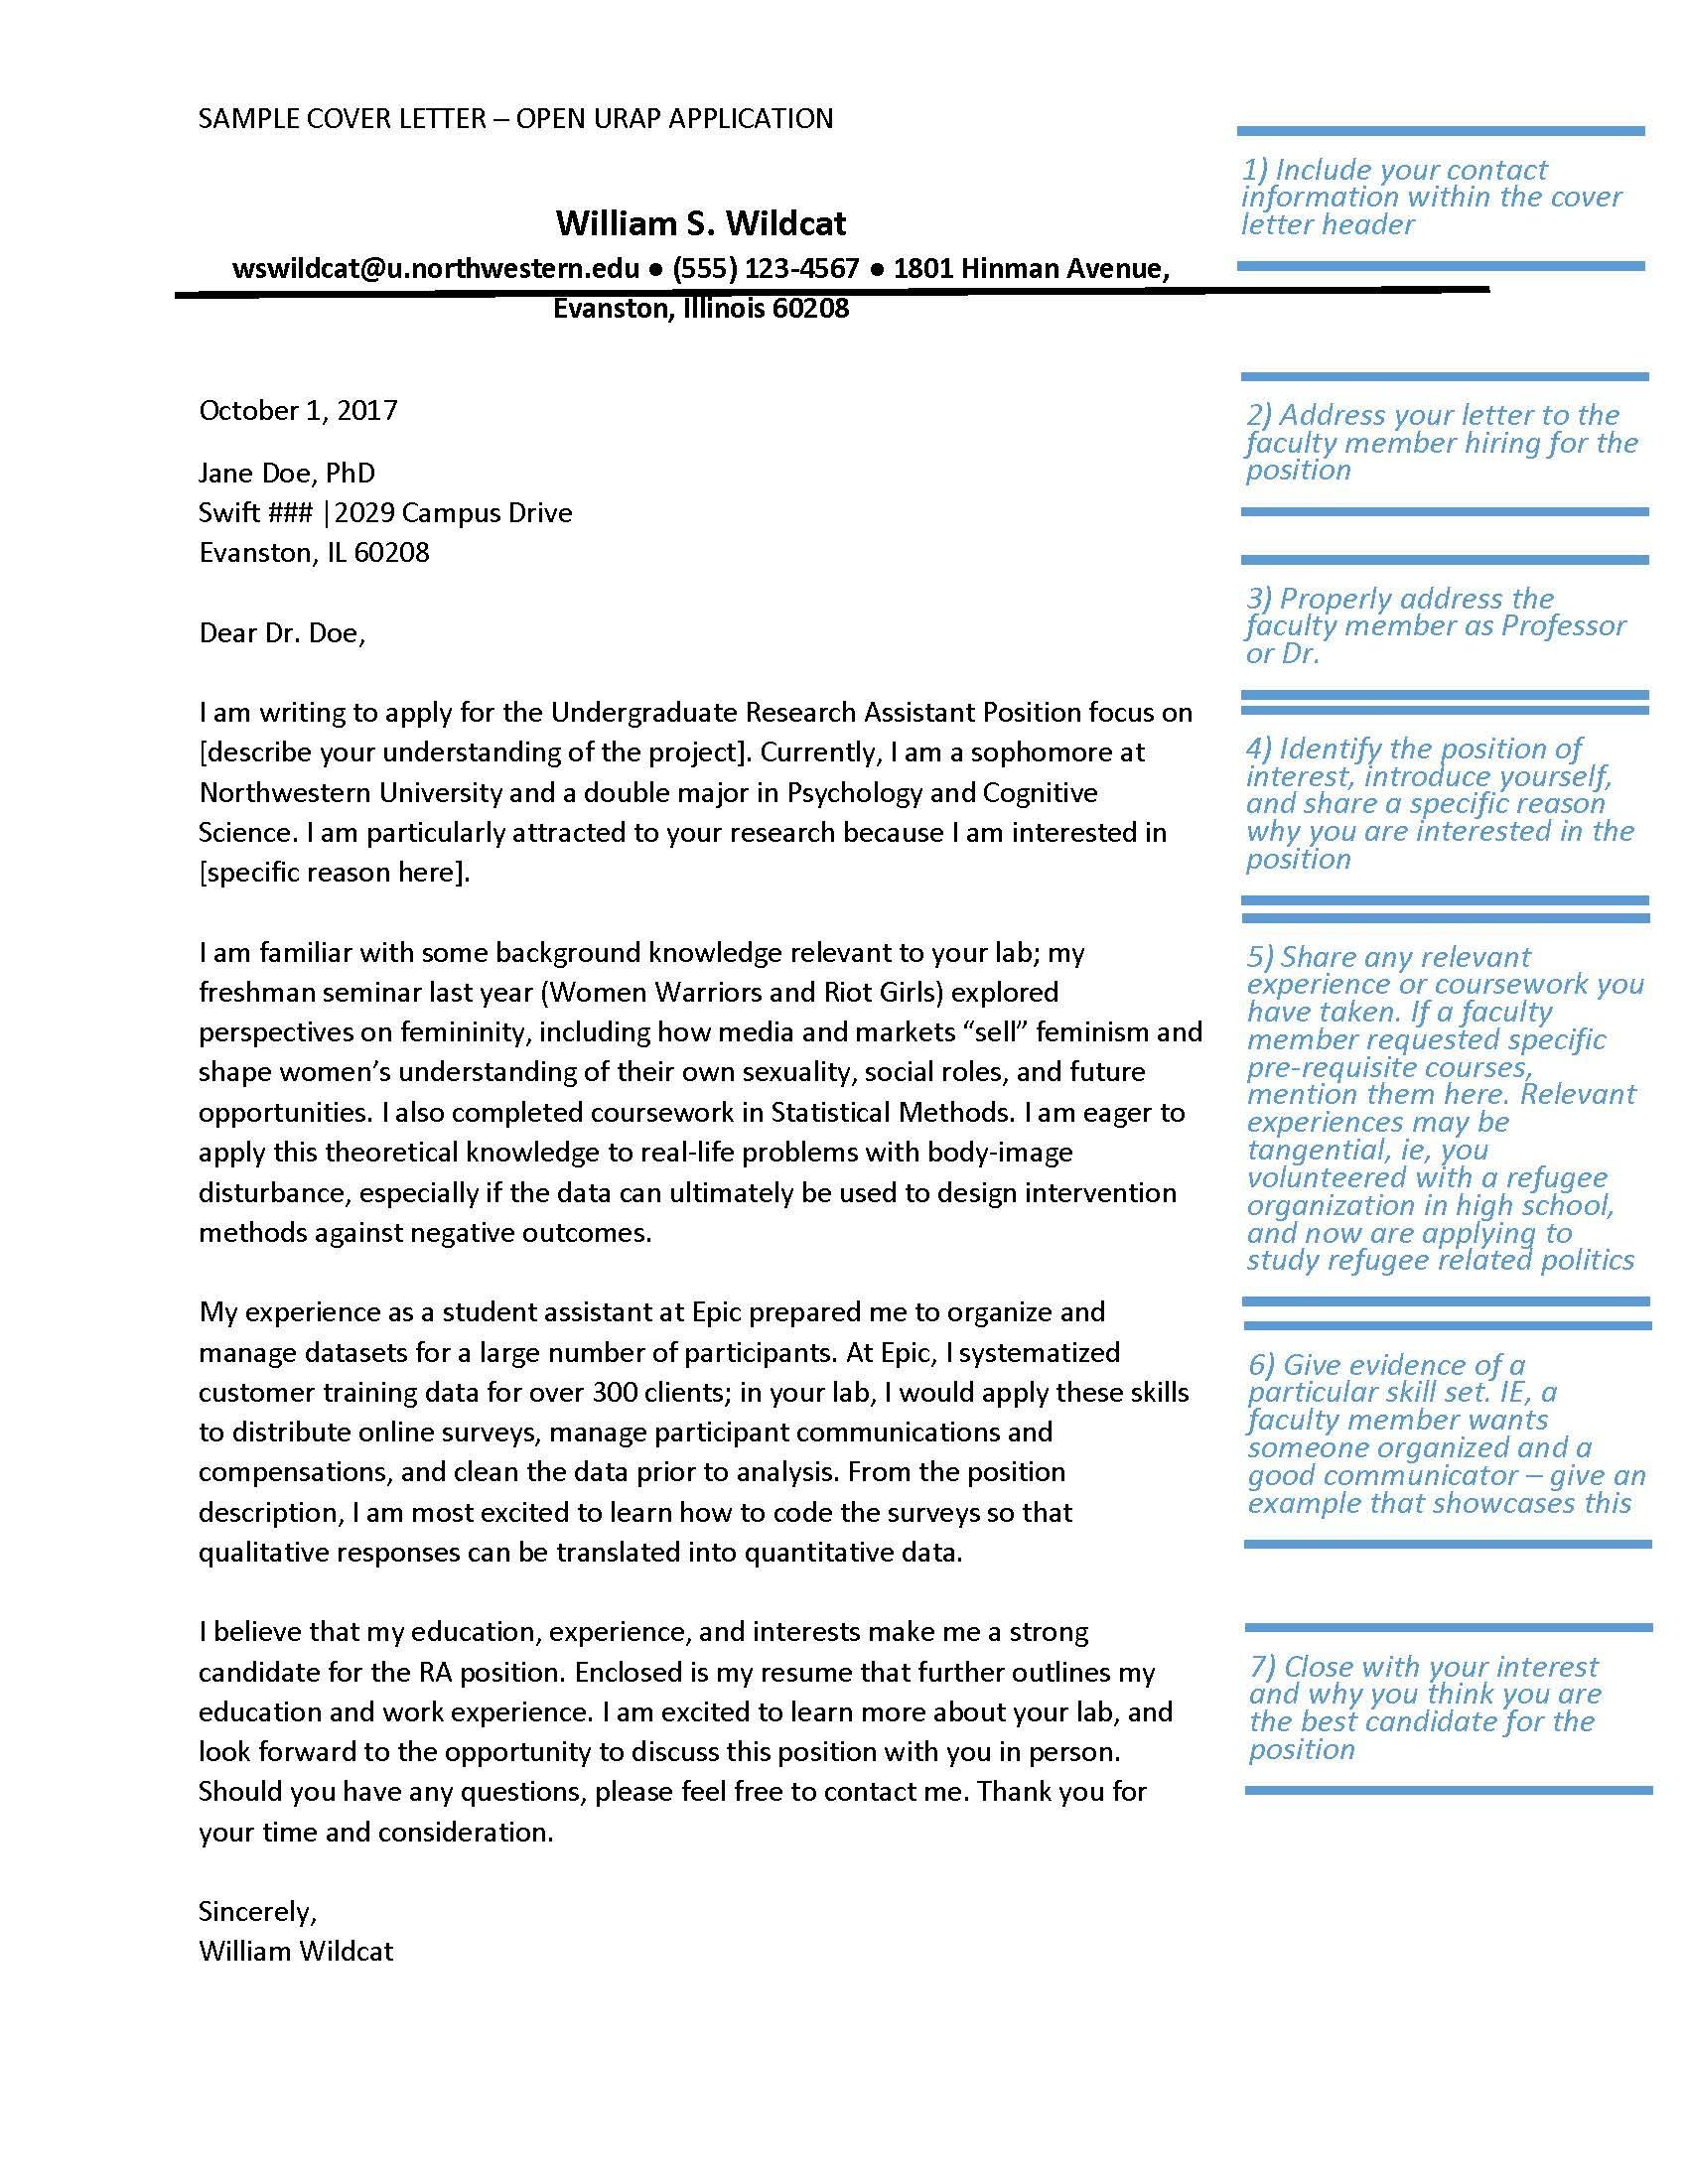 motivation letter for phd  Example Cover Letter for Open URAP Position   Office of ..